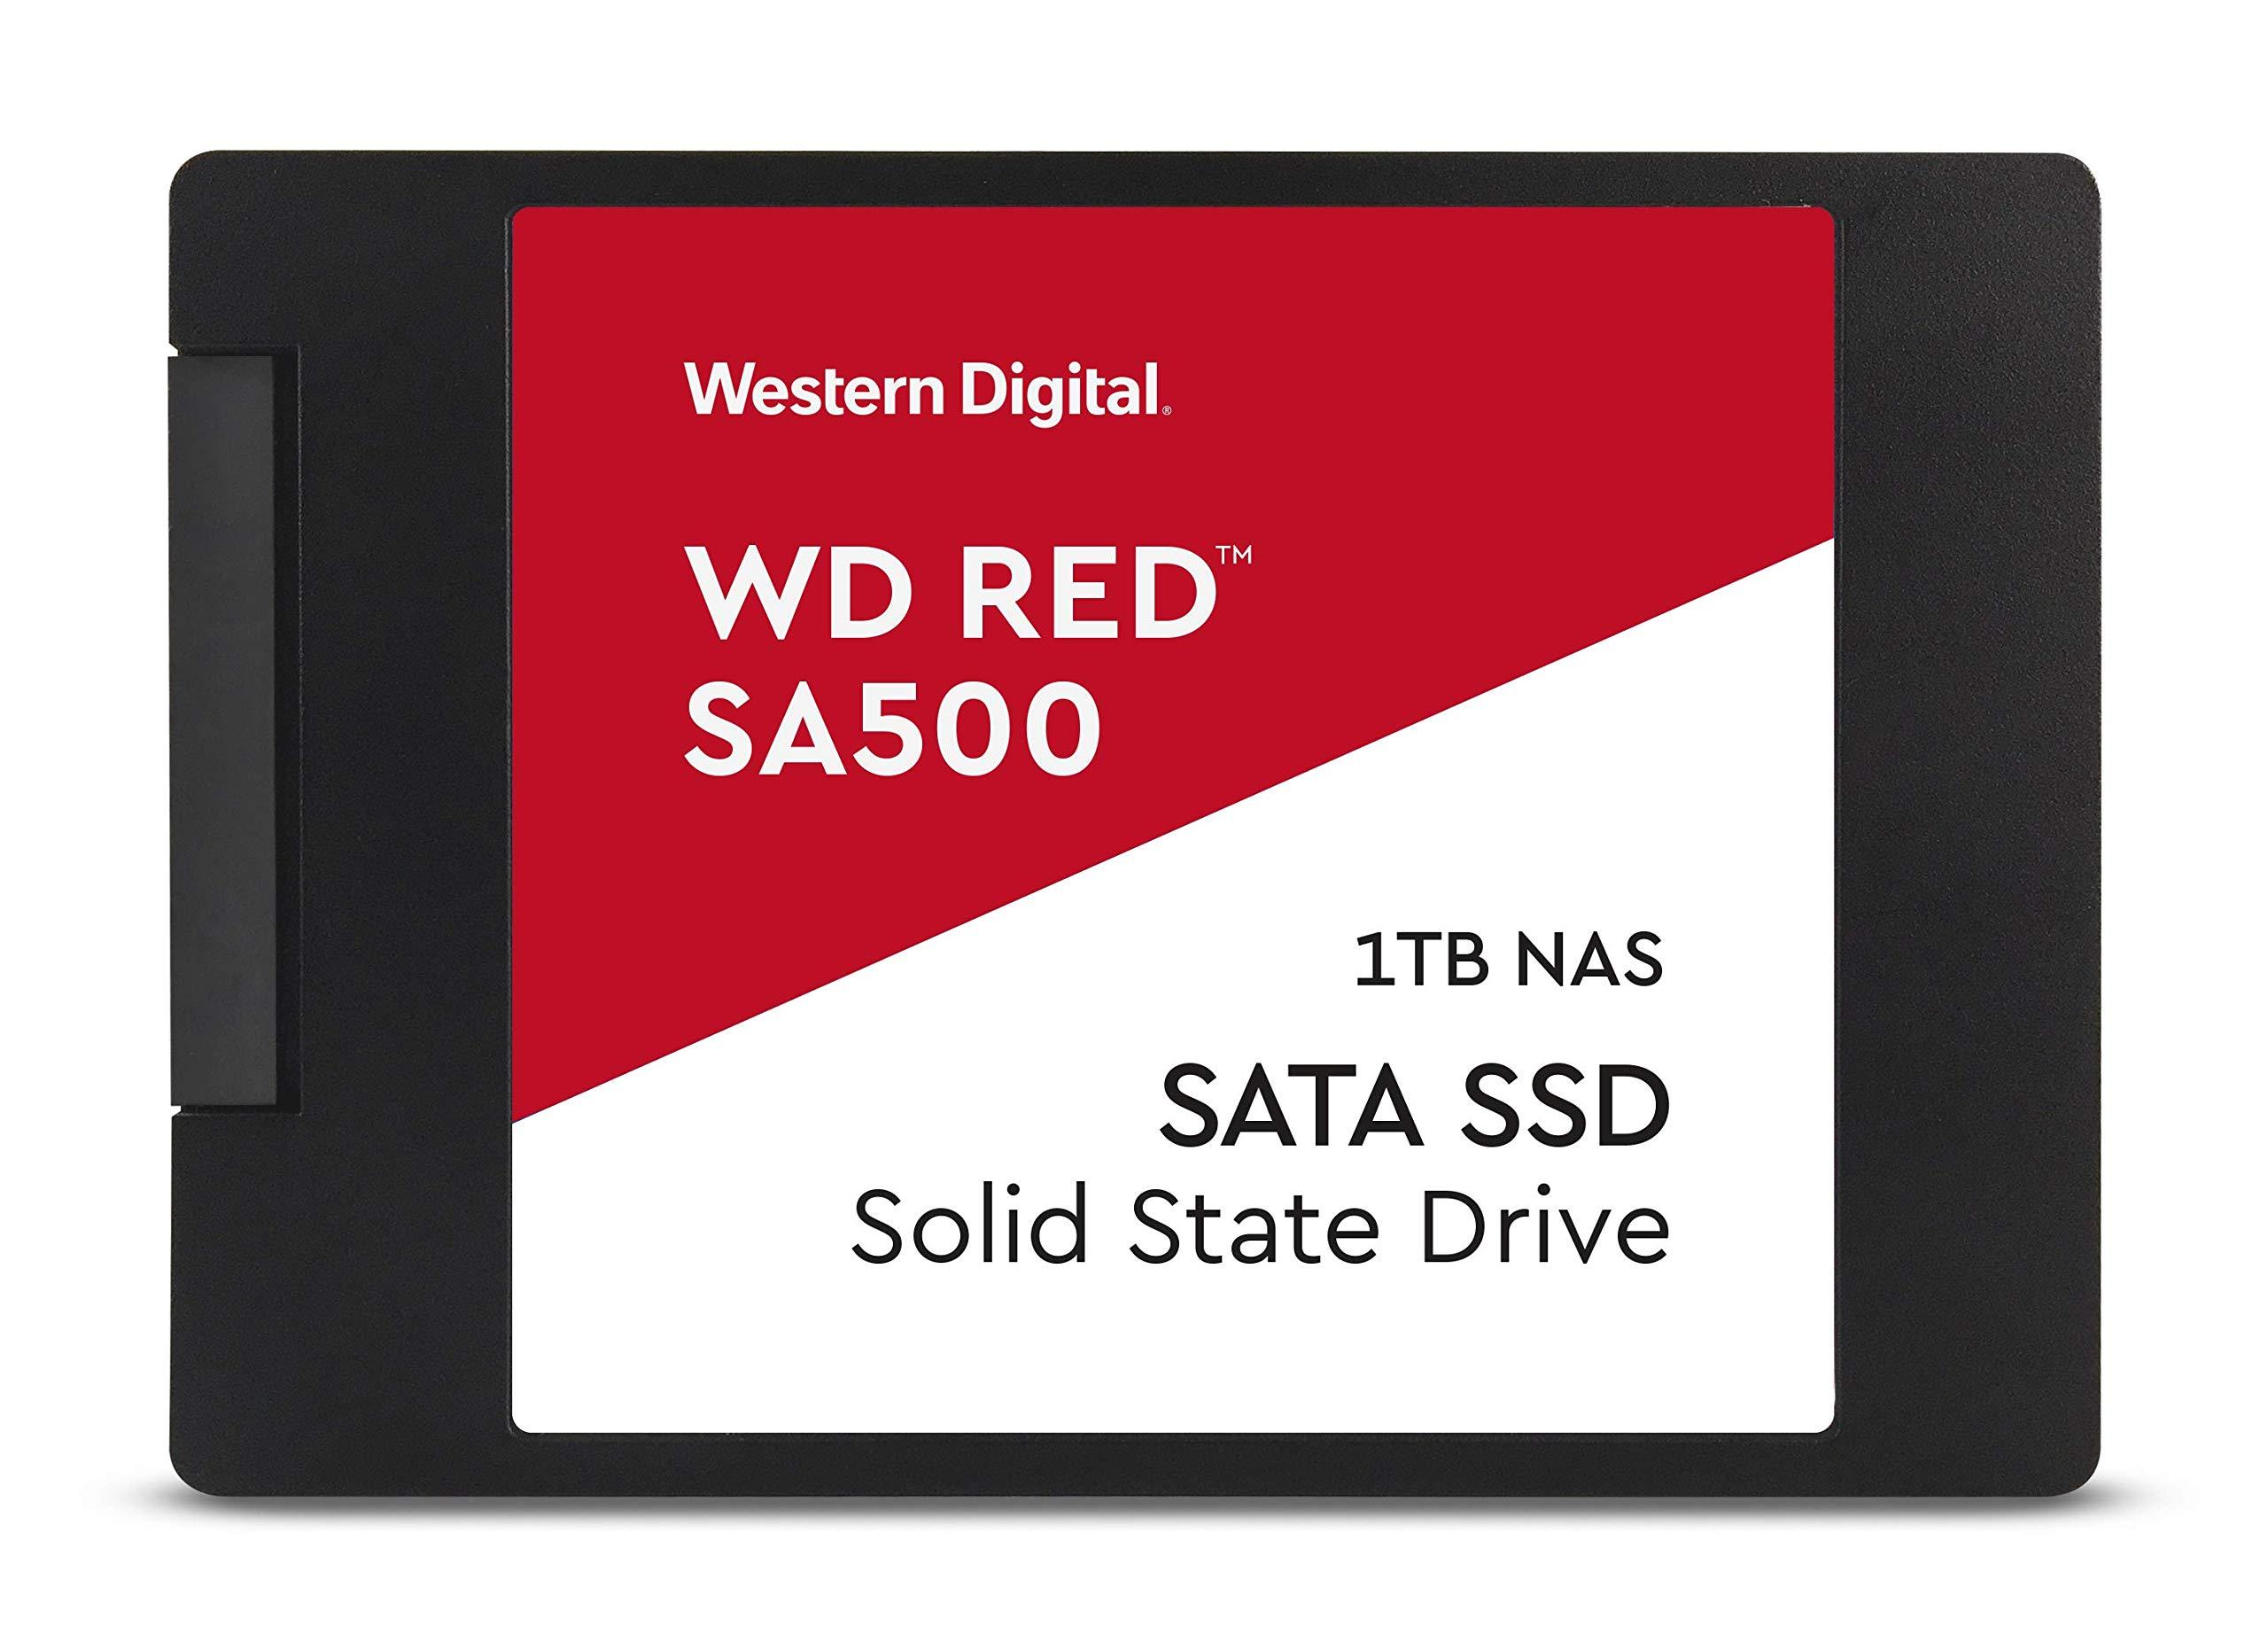 SSD 1TB SATA WD Red SA500 NAS 1TB 3D NAND 6 GB/S 2.5/7mm Up